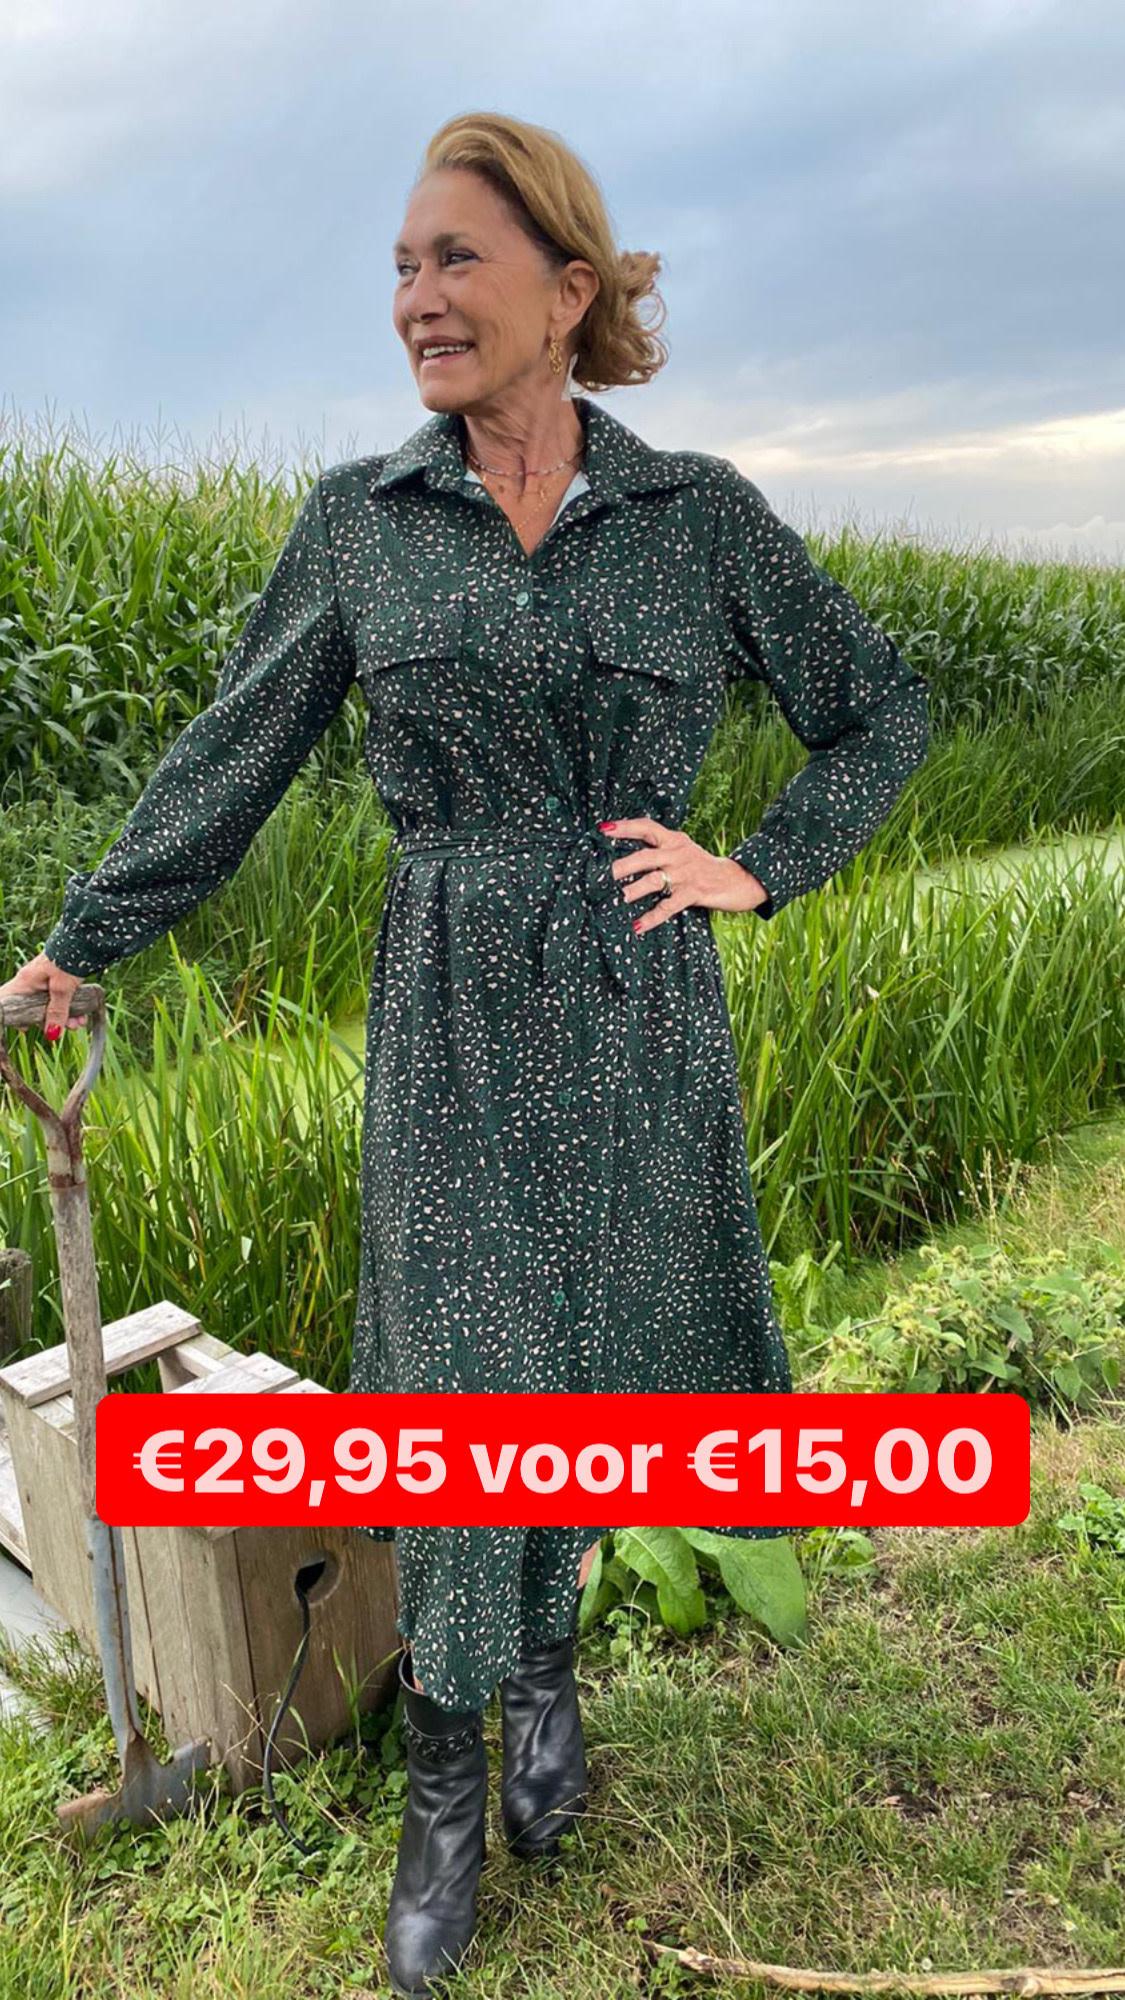 93761 Jumelle Dress Maxi Panter Green